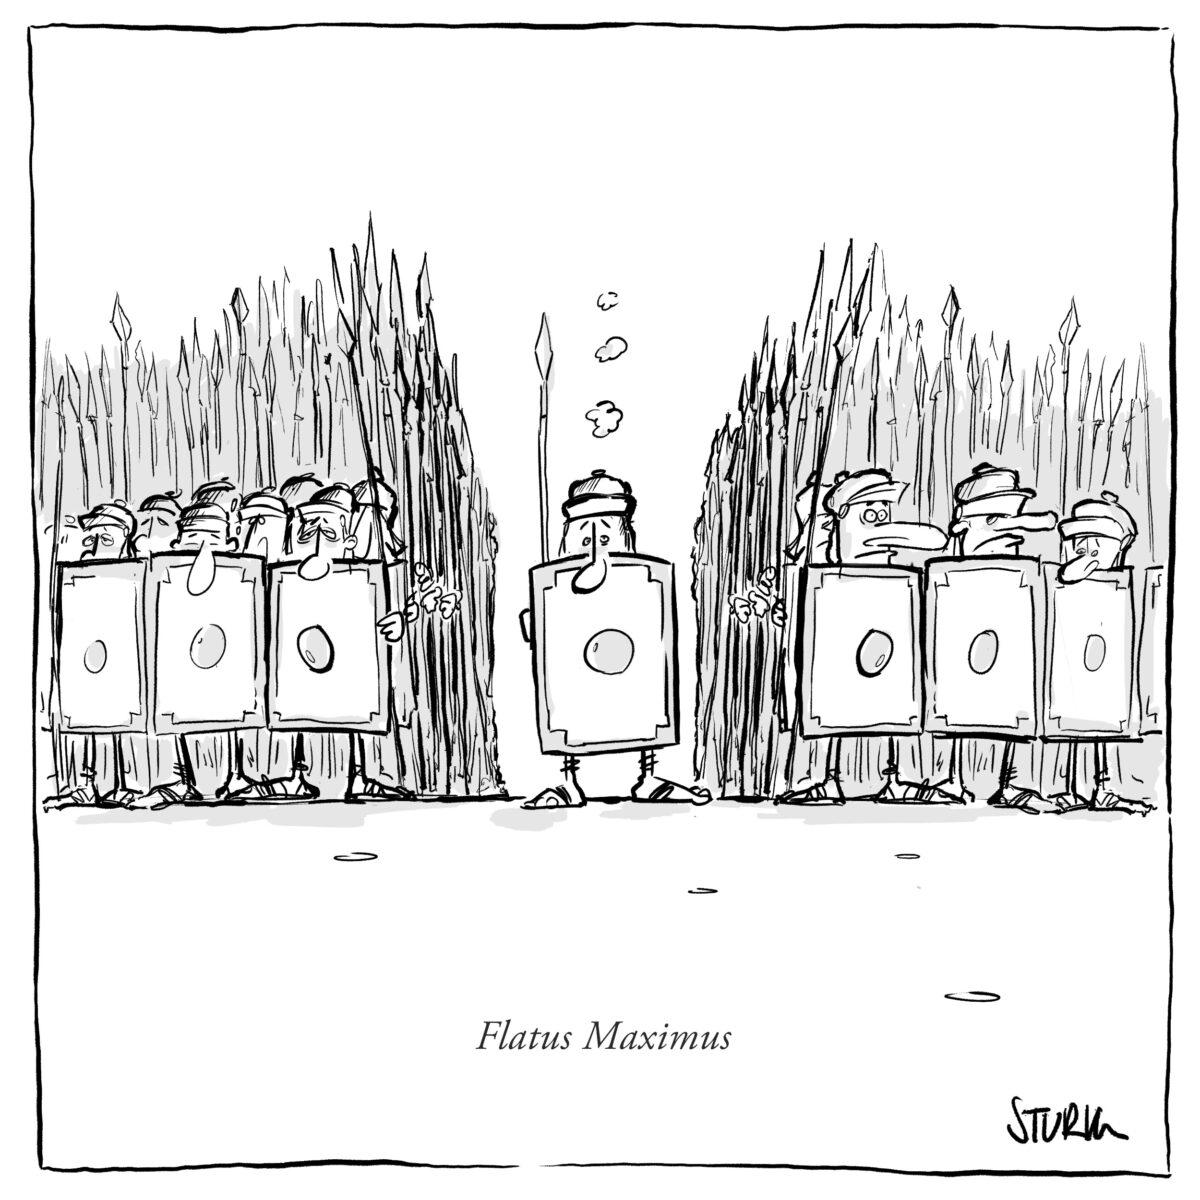 Flatus Maximus –Cartoon by Philipp Sturm